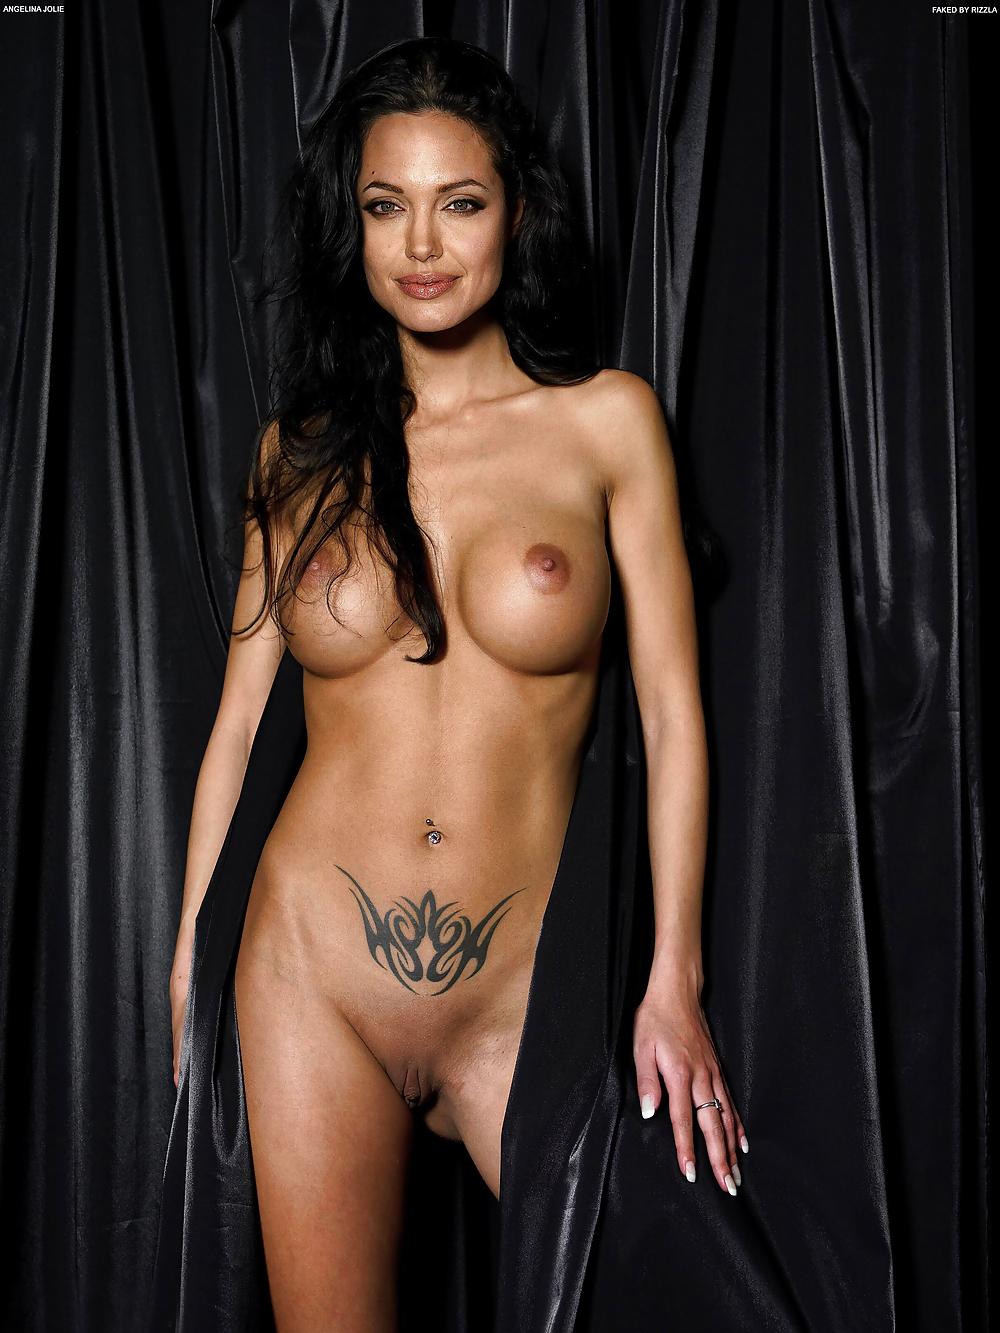 Bikini Angelina Jolie Nude Porn Gif